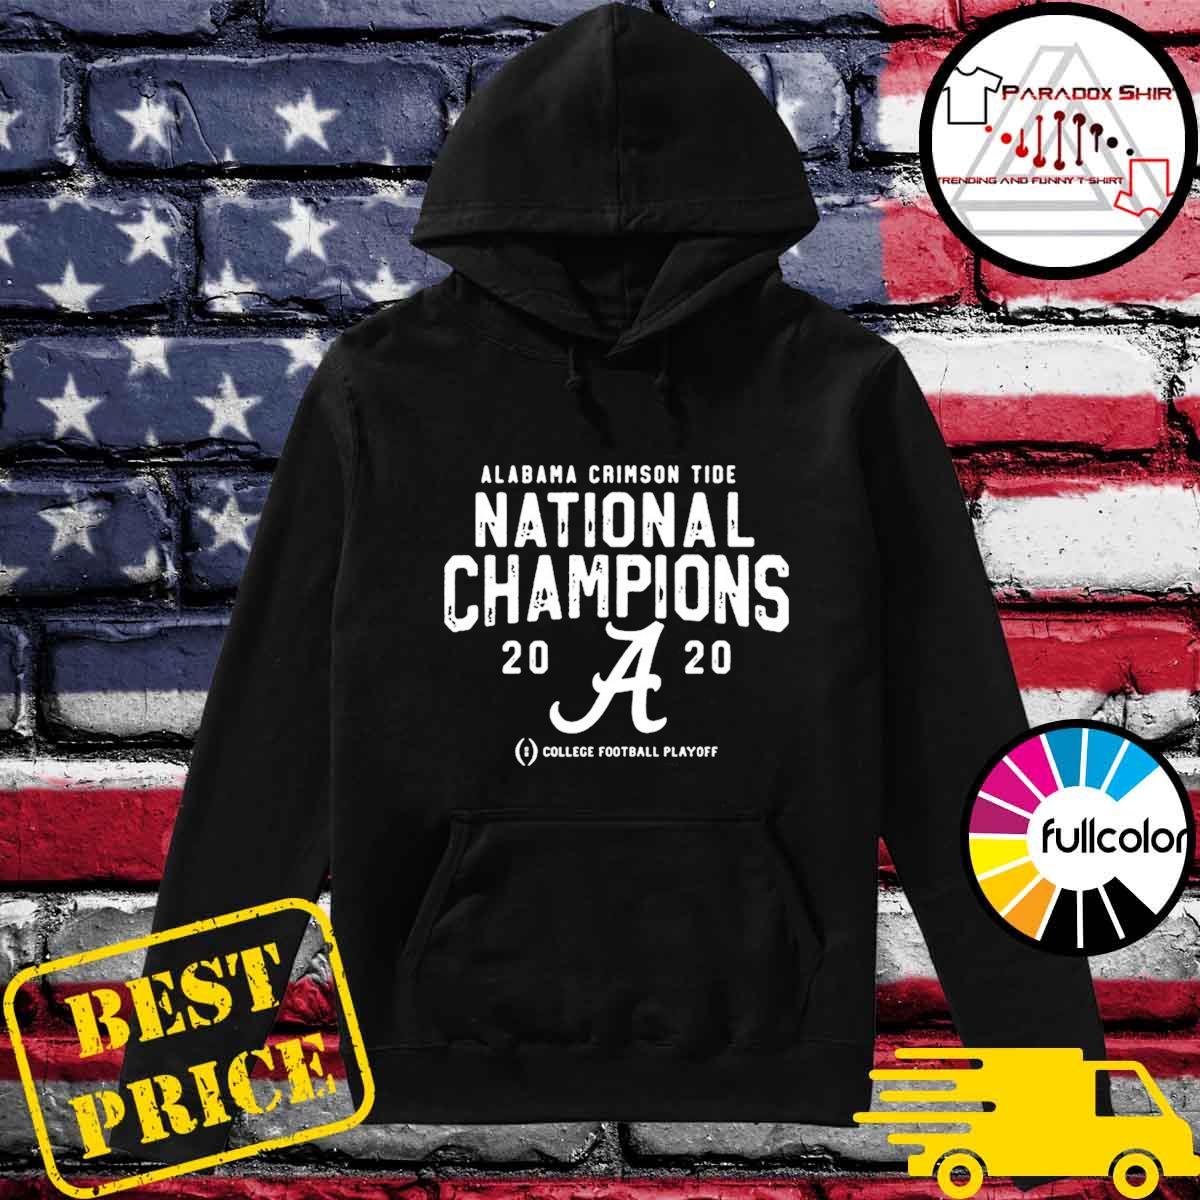 Alabama Crimson Tide College Football Playoff 2021 National Championship T-Shirt Hoodie